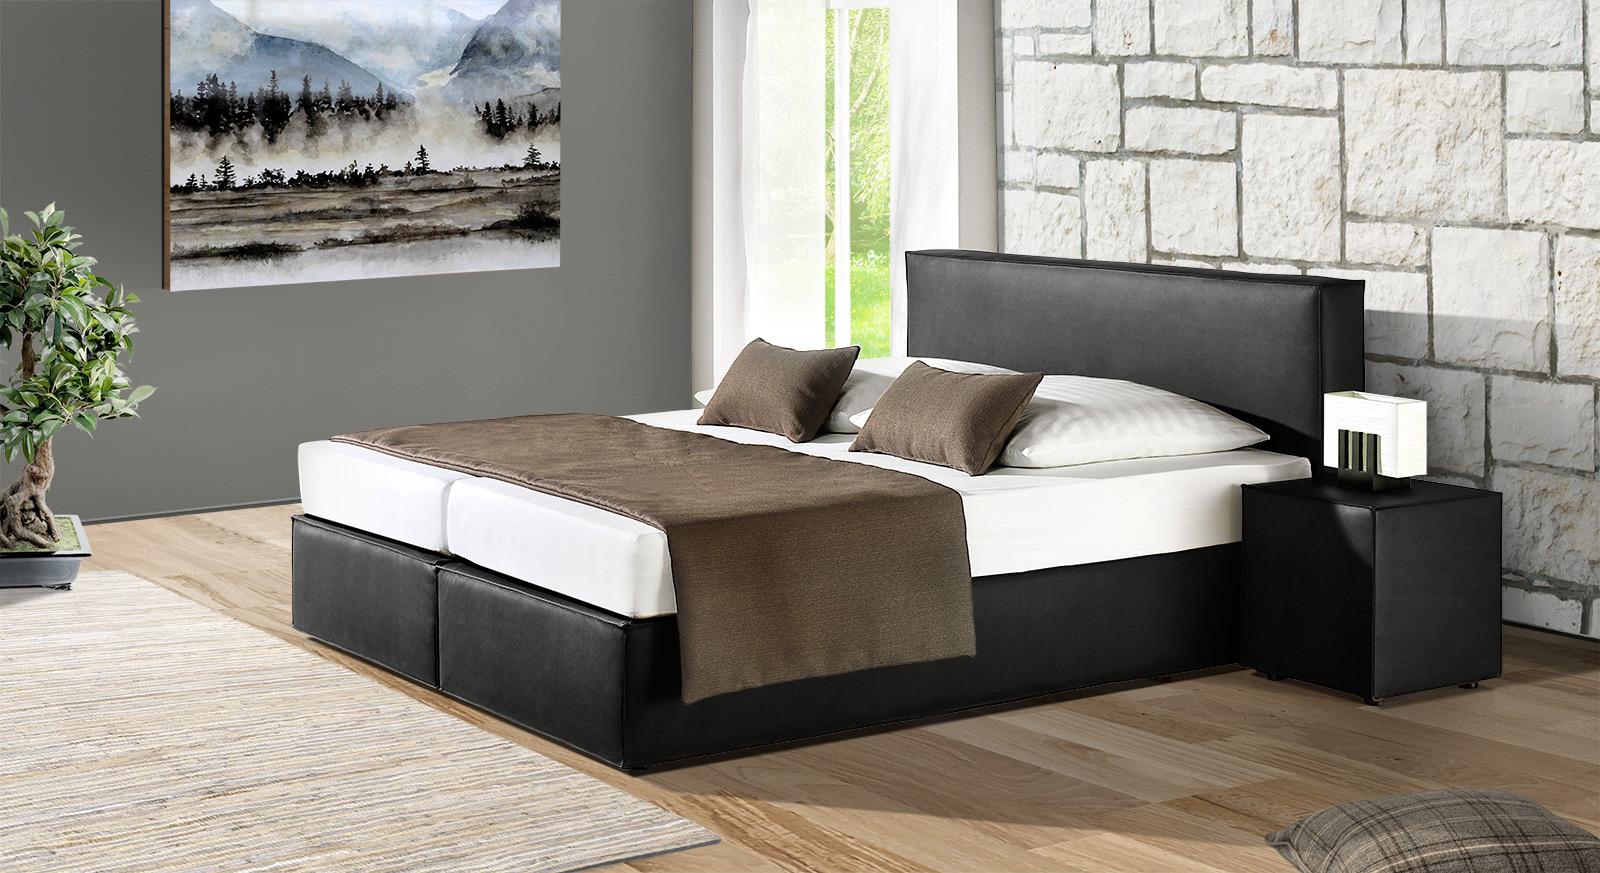 boxspringbett mit bonell federkernmatratze tolentino. Black Bedroom Furniture Sets. Home Design Ideas